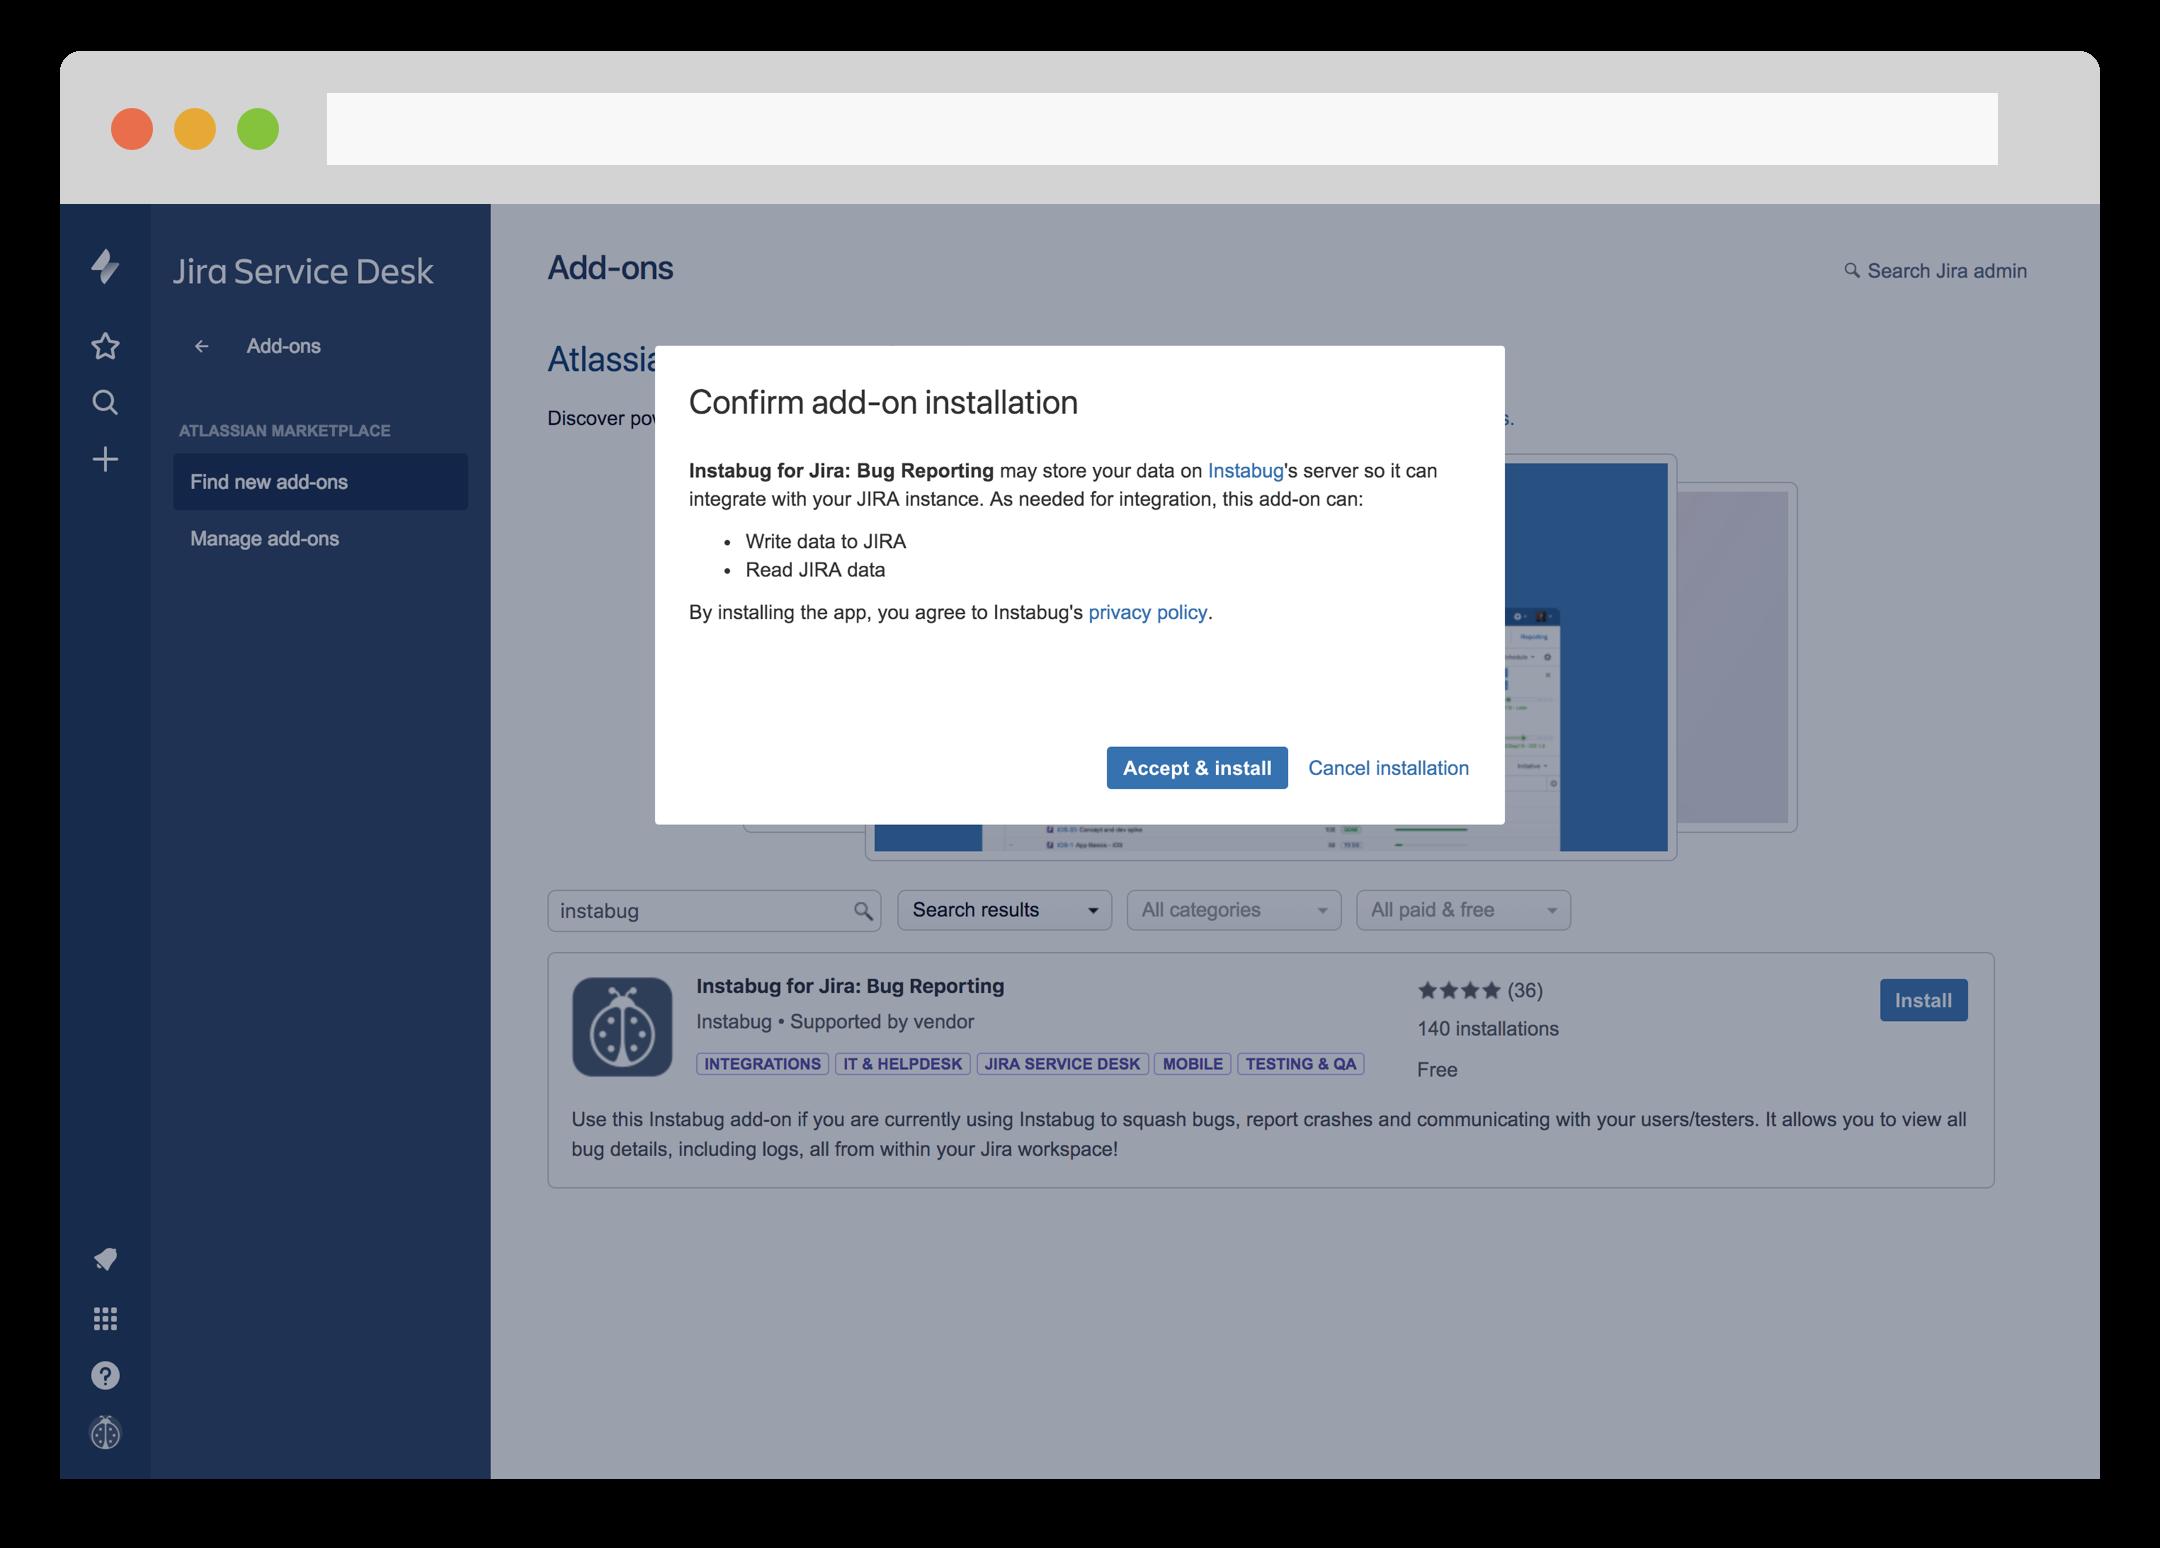 Instabug JIRA integration from JIRA's dashboard